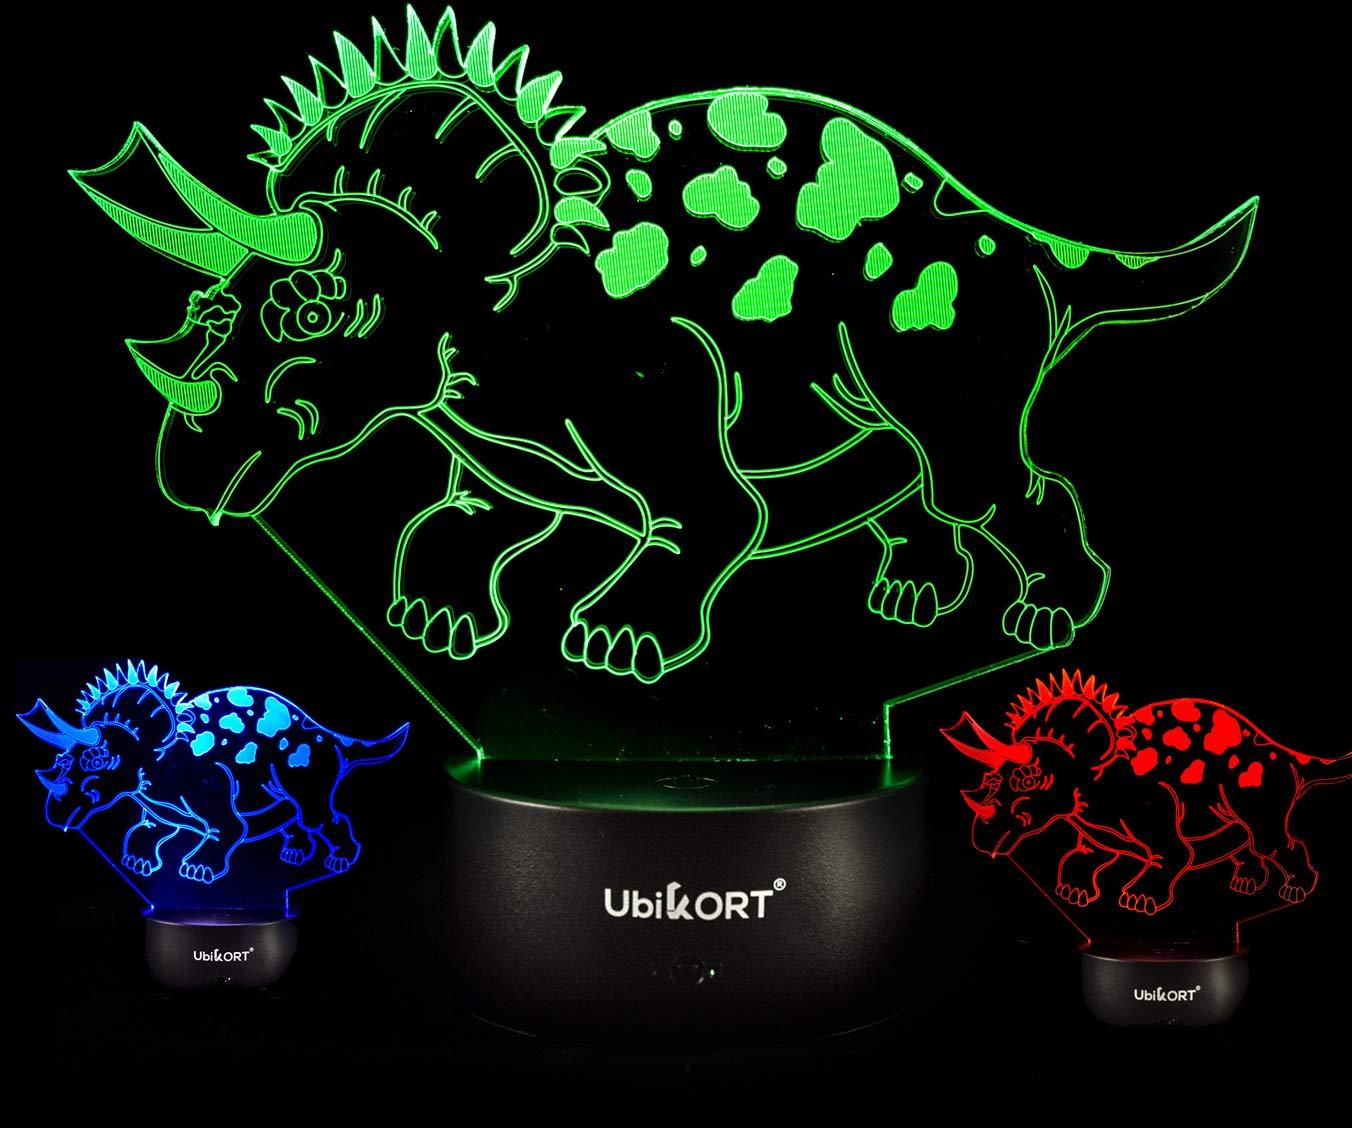 UbiKORT Dinosaur Lamp Night Light Triceratops Dinosaur Light Jurassic 3D Dinosaur Lamps for Boys Room Great Birthday Gift, 3D LED Illusion Lamp 7 Colors Remote Control